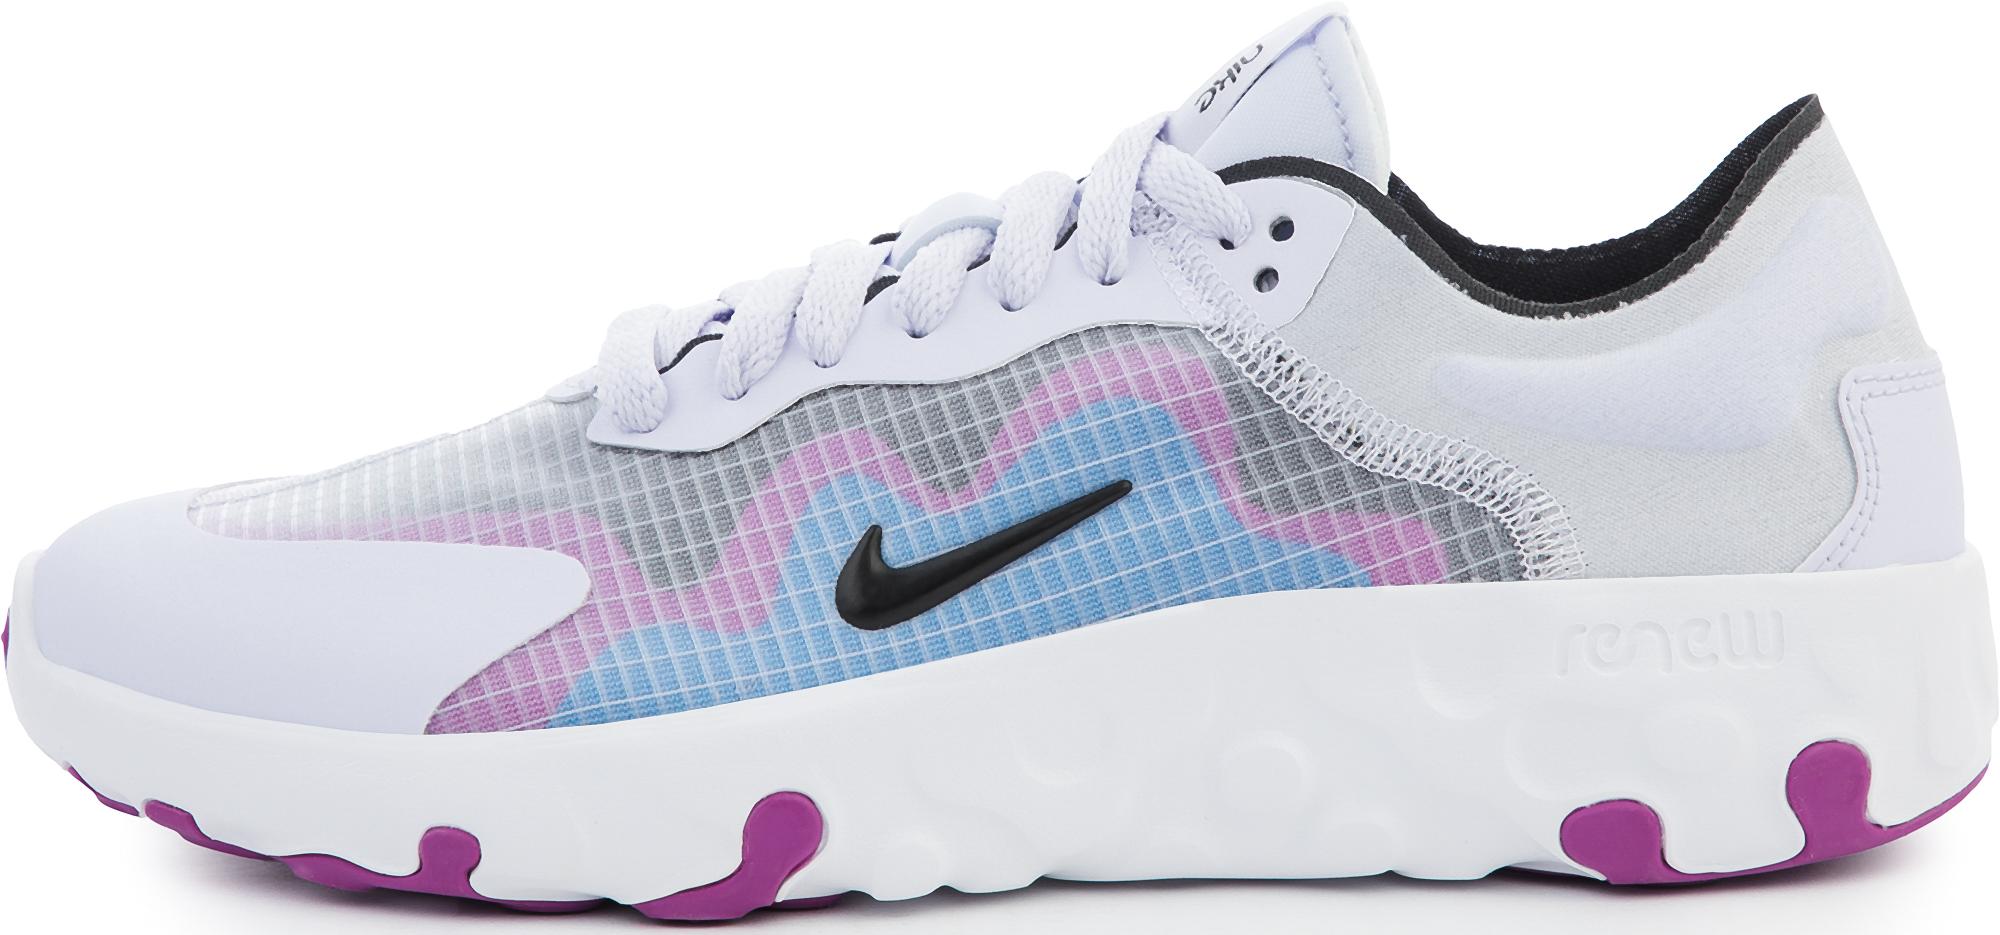 Nike Кроссовки женские Renew Lucent, размер 38